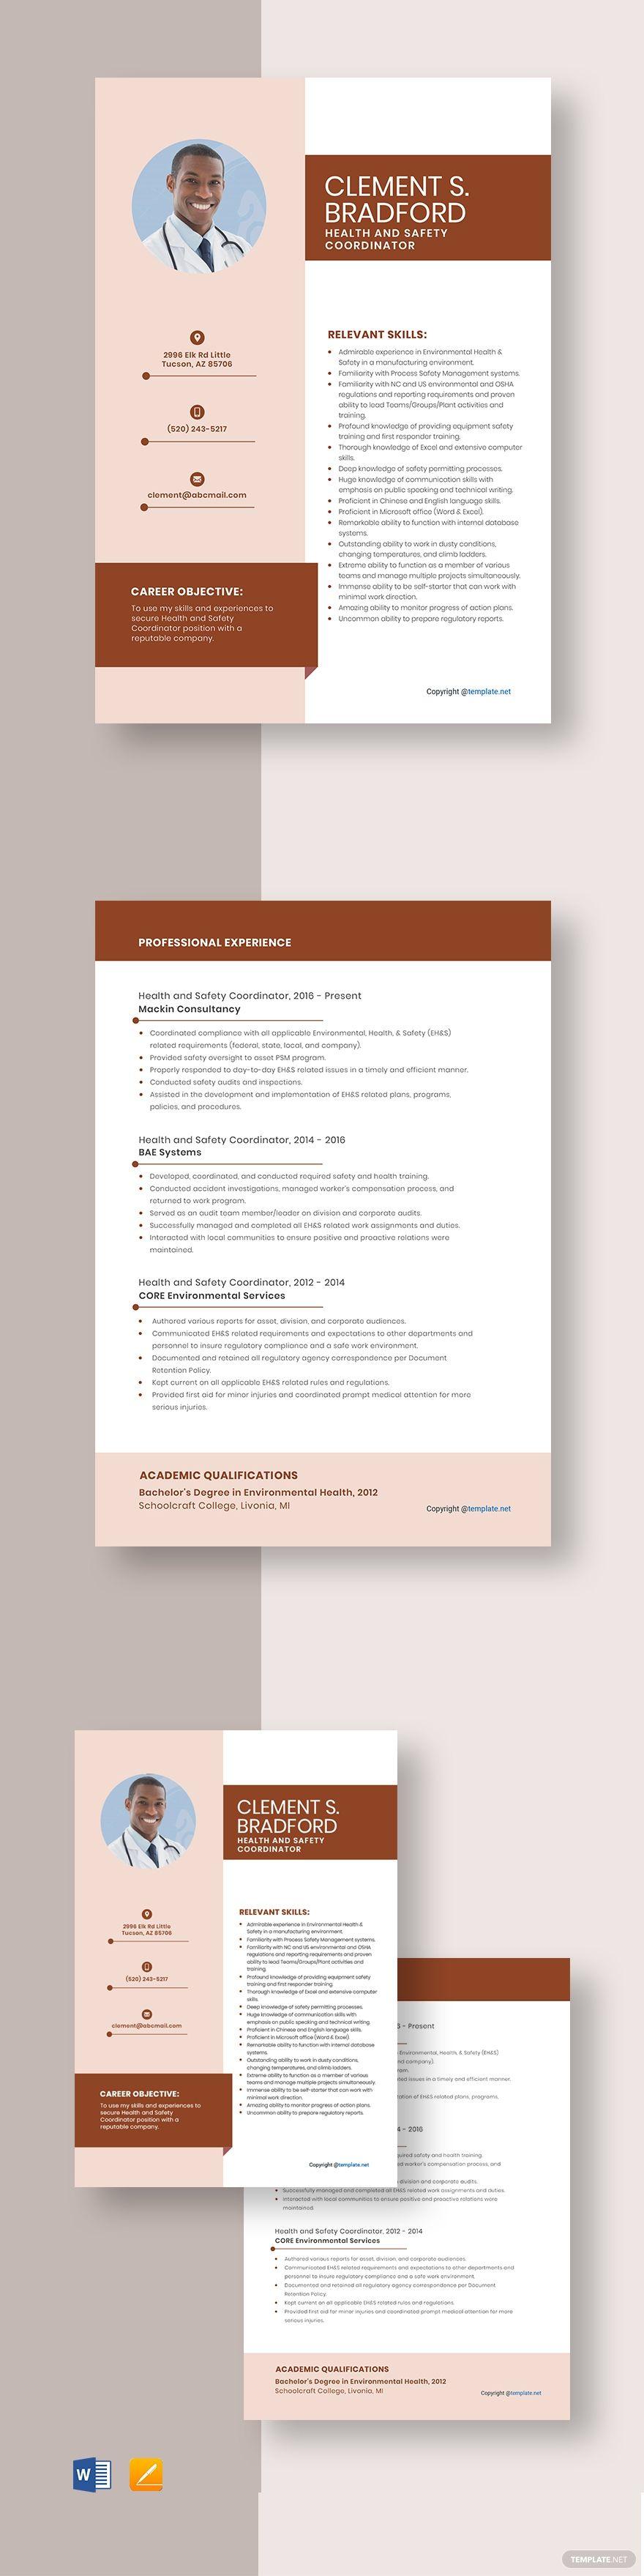 Health And Safety Coordinator Resume Cv Template Pdf Word Apple Pages Health And Safety Resume Template Resume